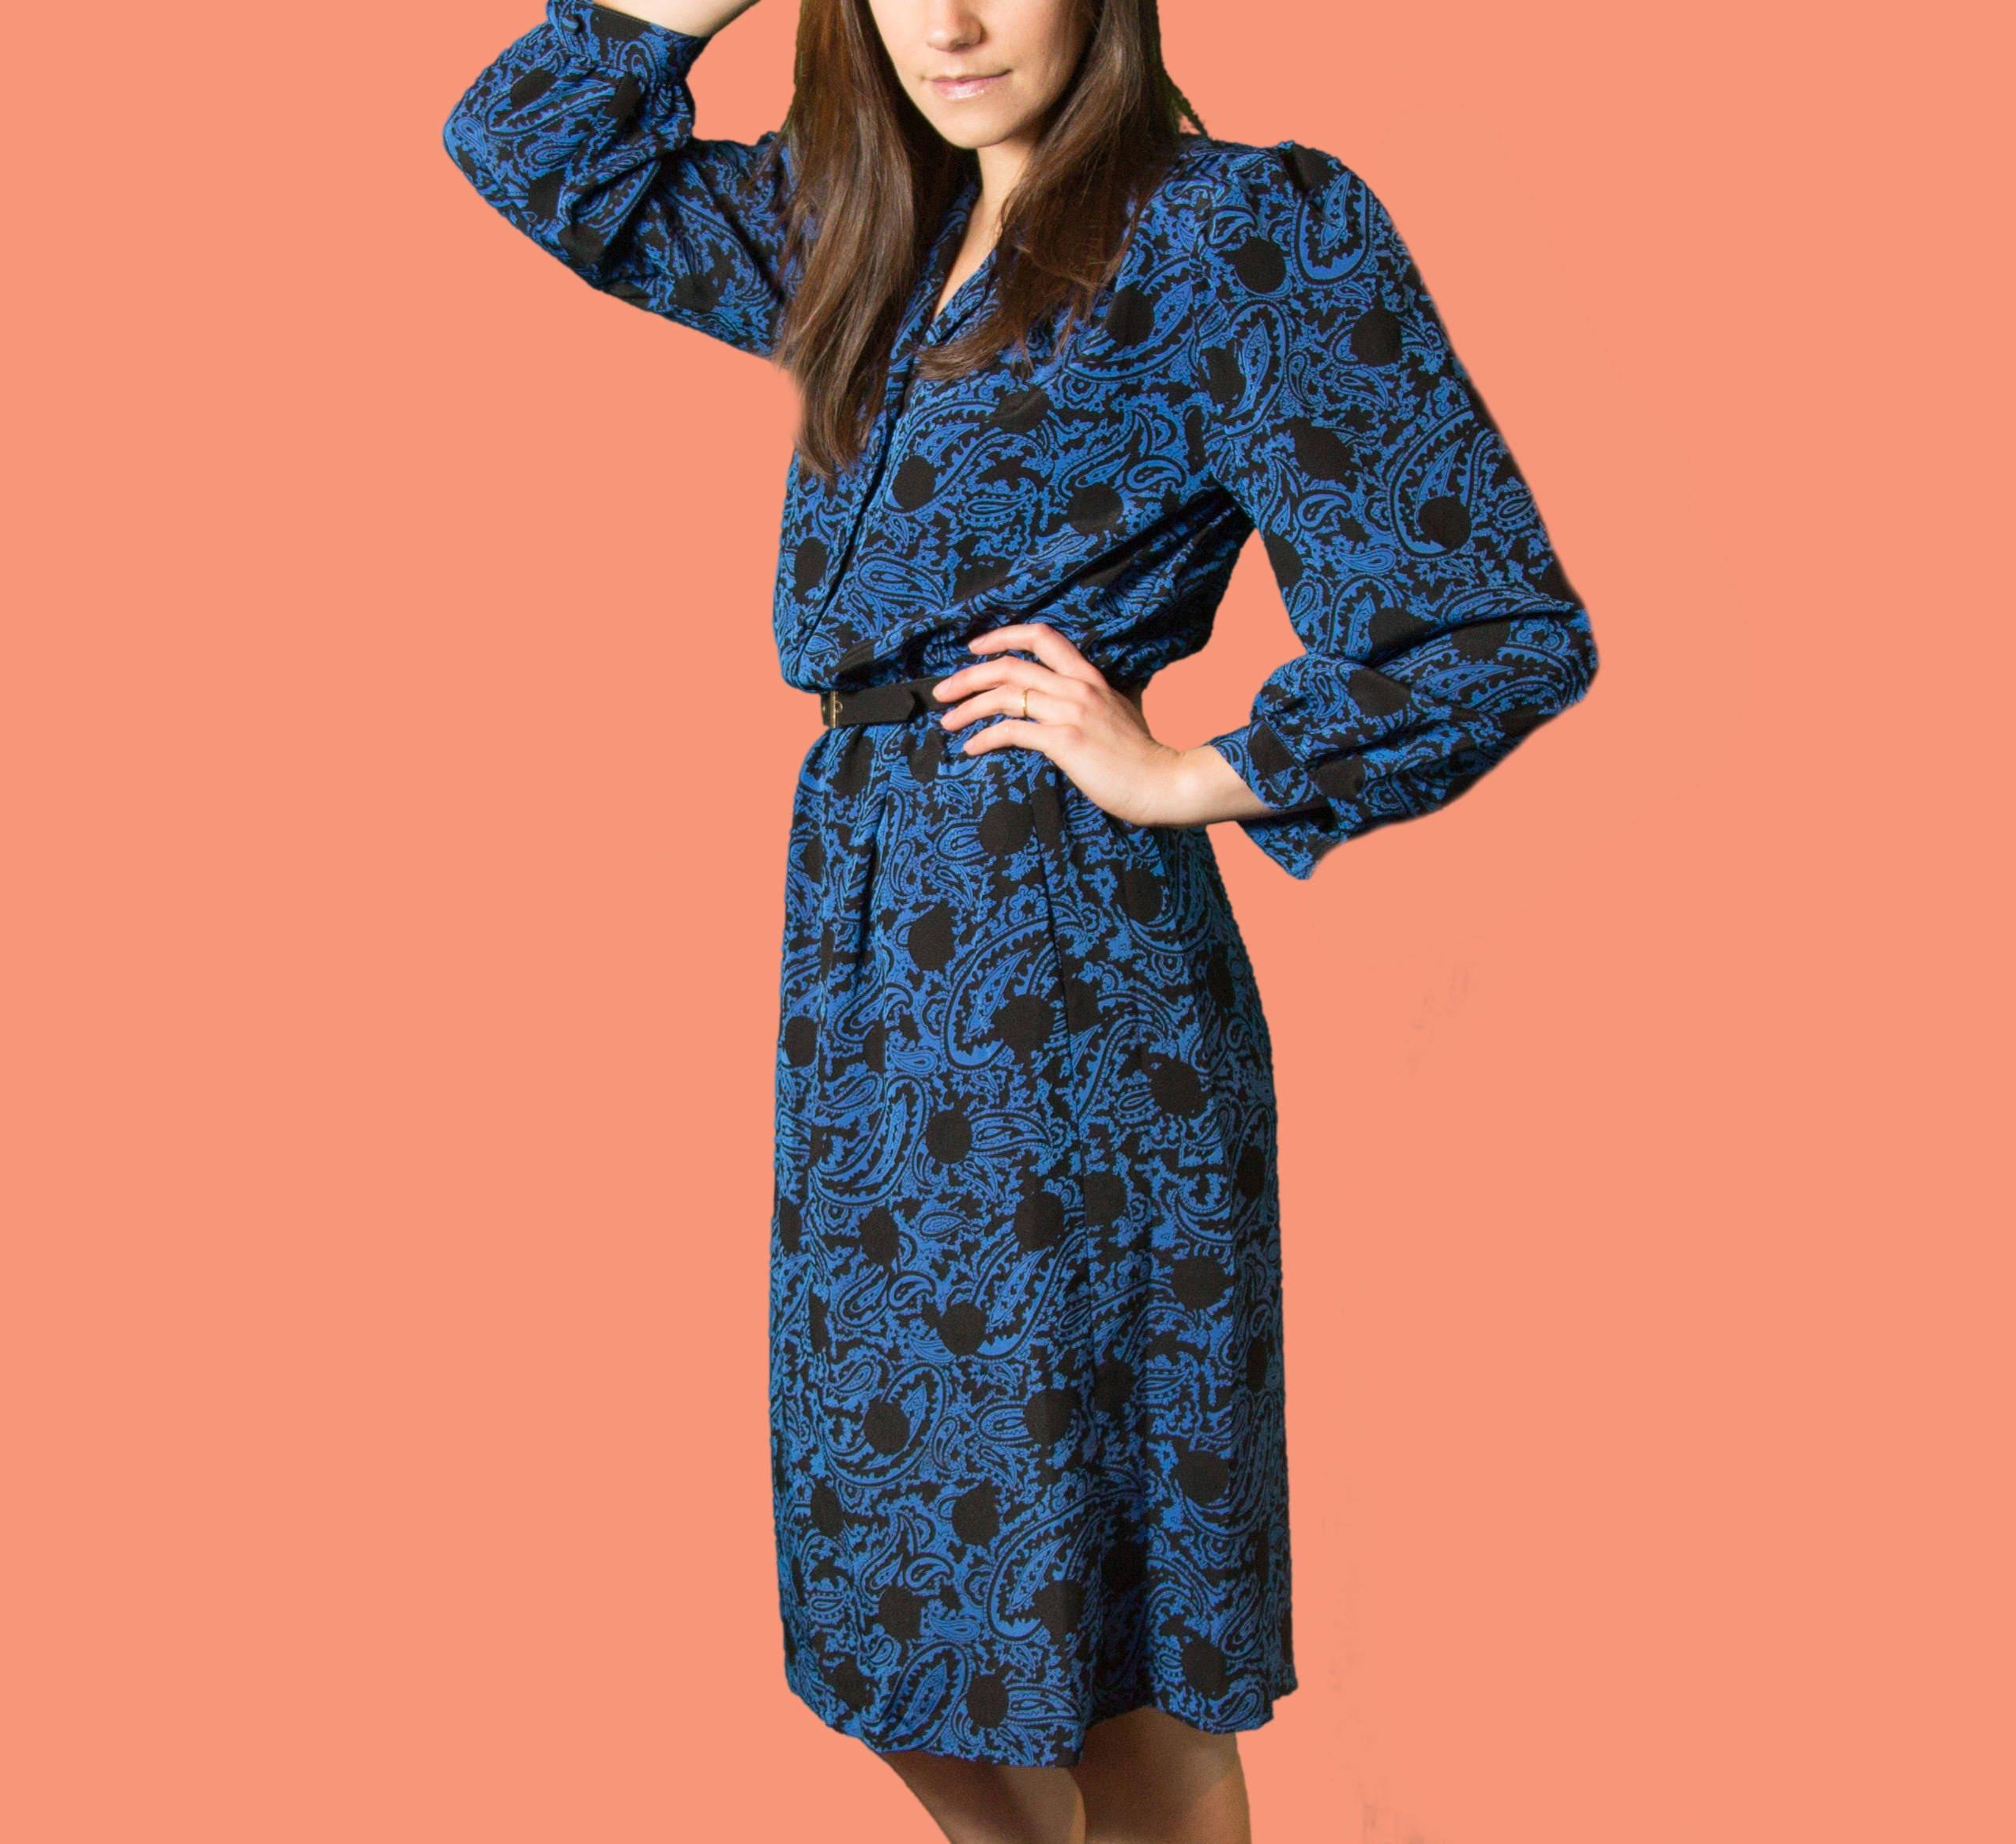 09c77b6c9c Vintage Blue Paisley Dress - Thin Flowy Summer Long Oversized Sleeve Dress  by Suli Petites. gallery photo gallery photo gallery photo gallery photo  gallery ...